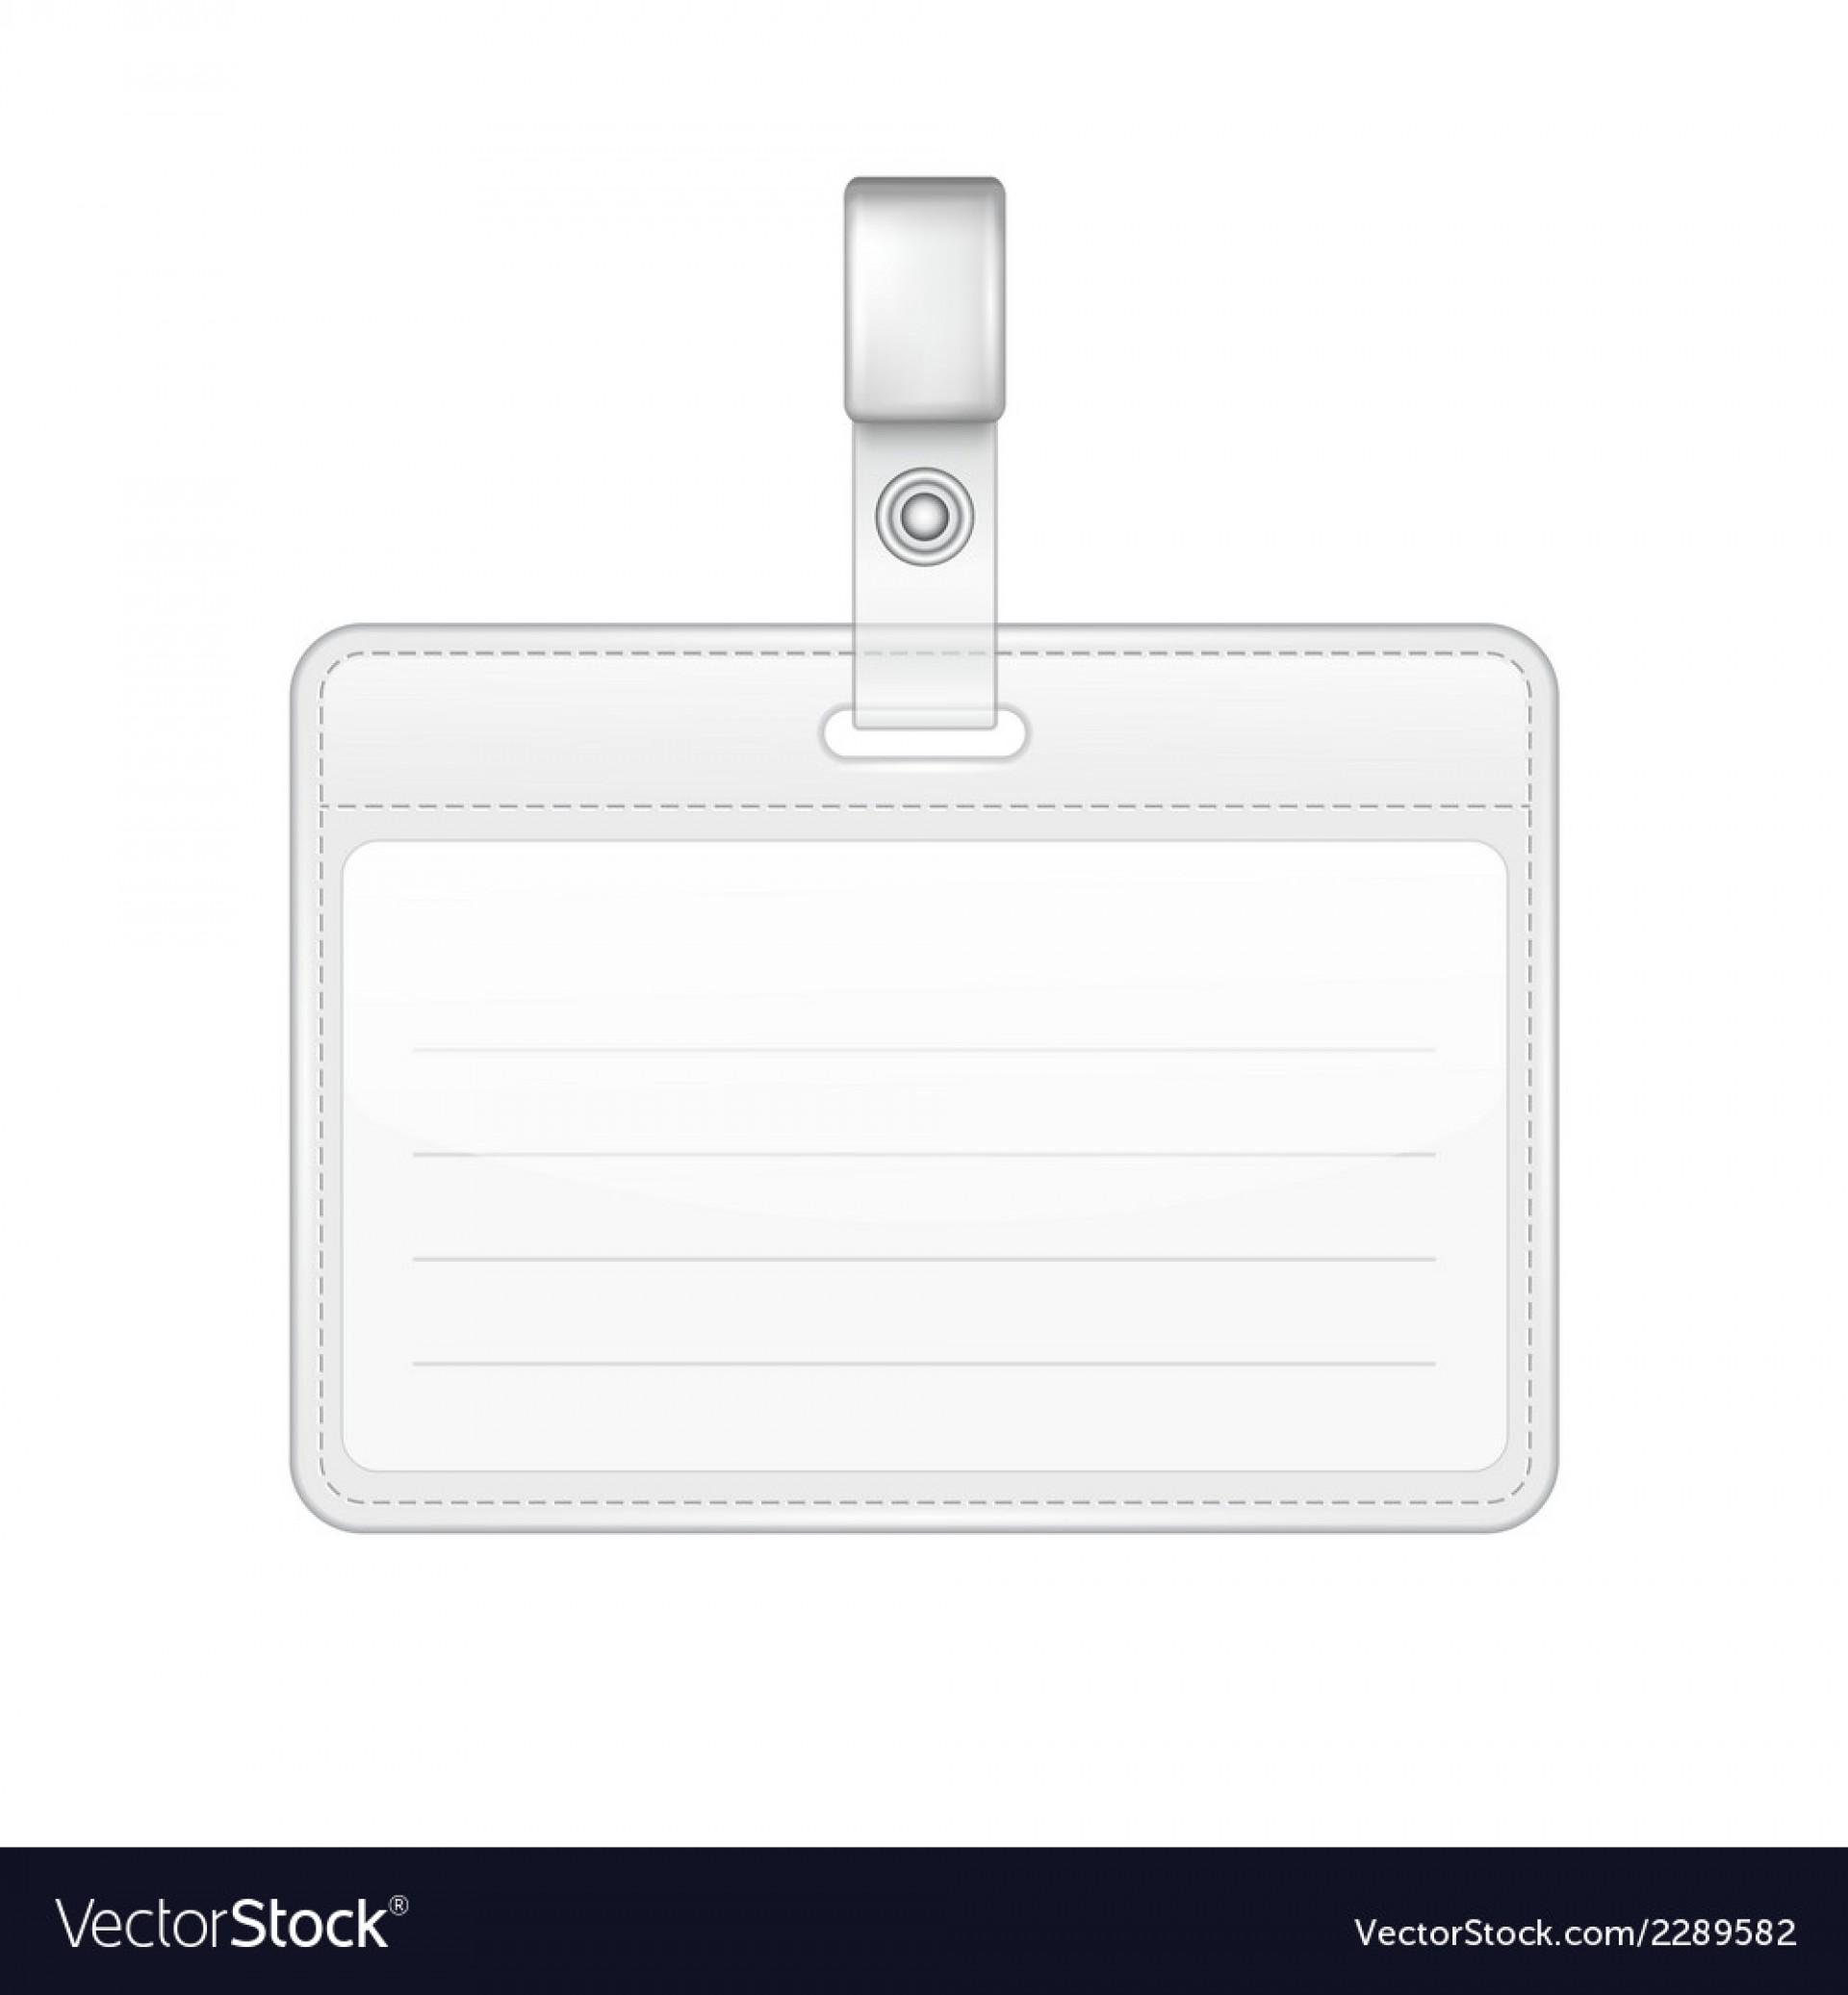 005 Impressive Blank Id Card Template Design  Free Download Editable1920